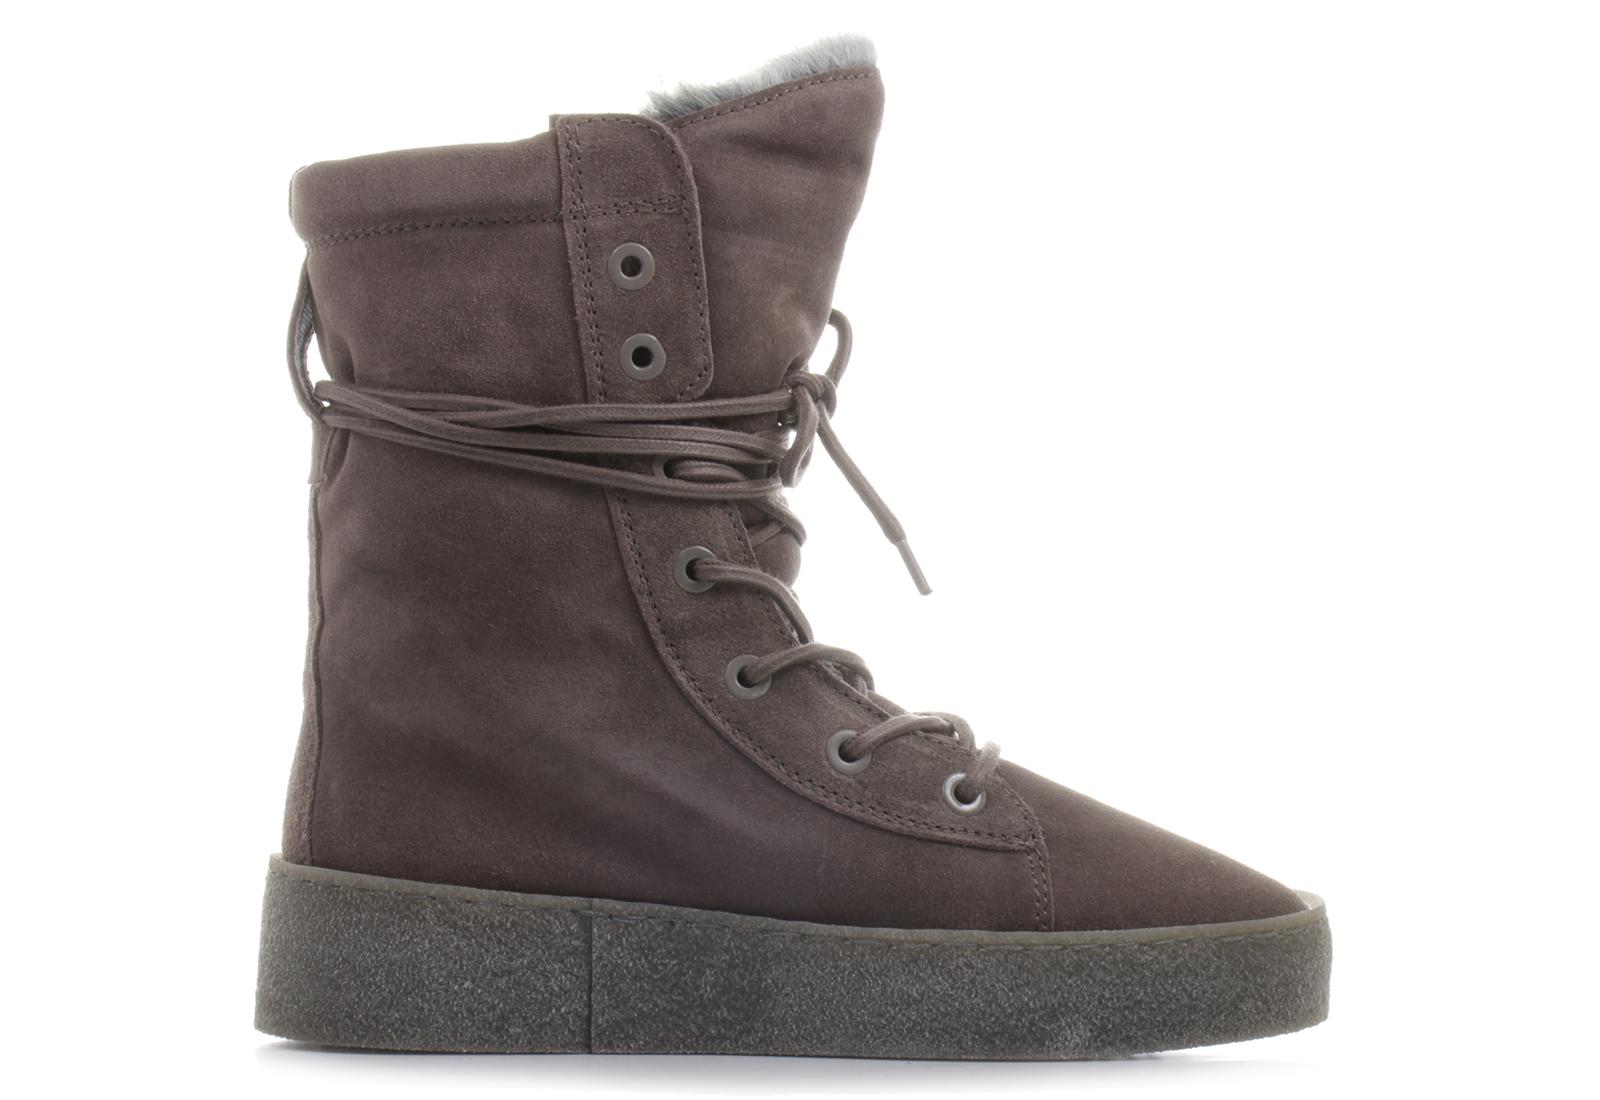 cfbad5e9d3 Bronx Casual Crna Čizme - Bronx - Office Shoes - Online prodavnica obuće